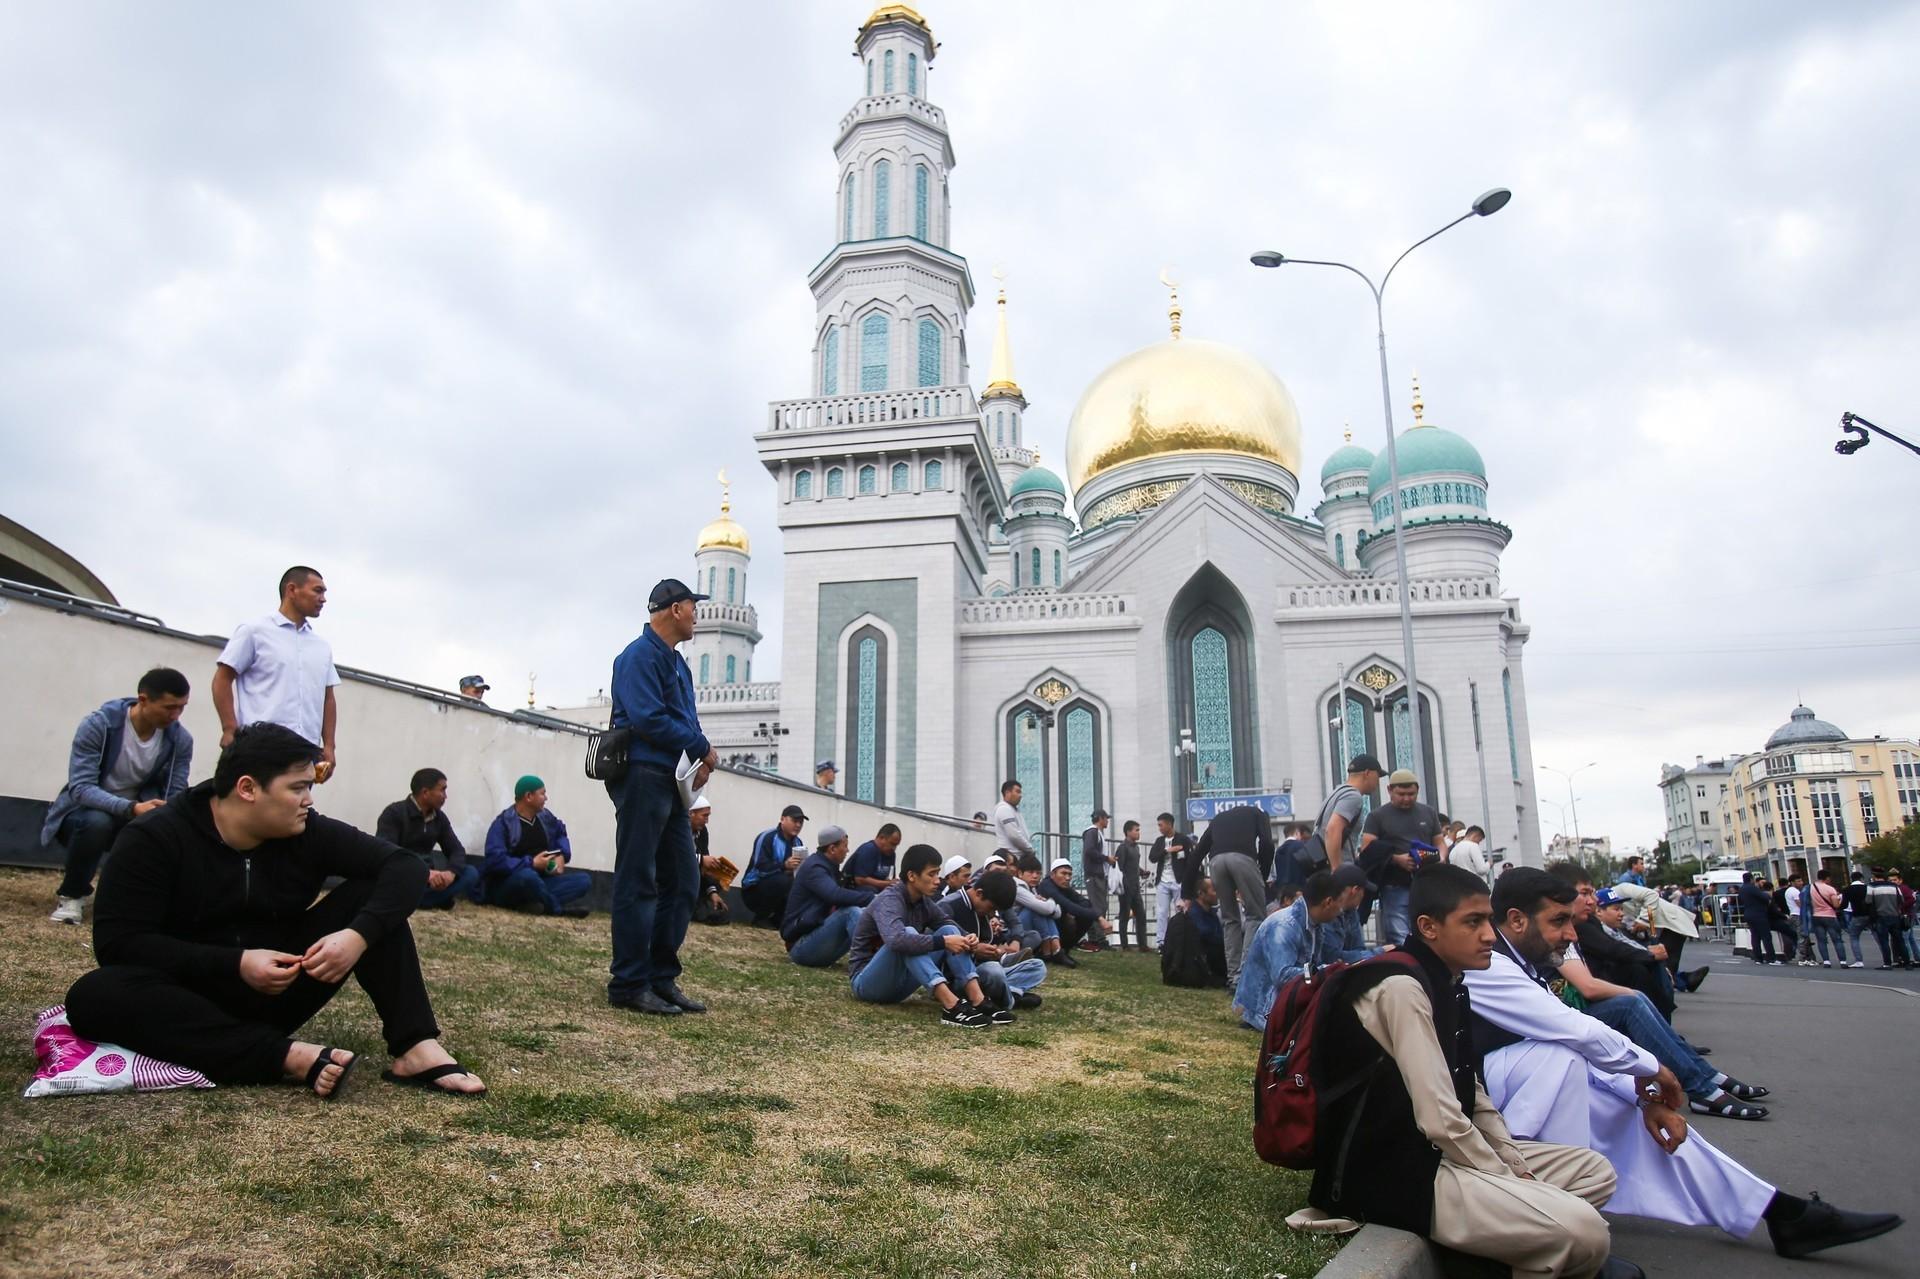 Tak seperti di Indonesia, perayaan Hari Raya Idul Adha di Rusia tahun ini dirayakan pada hari Selasa, (21/8).